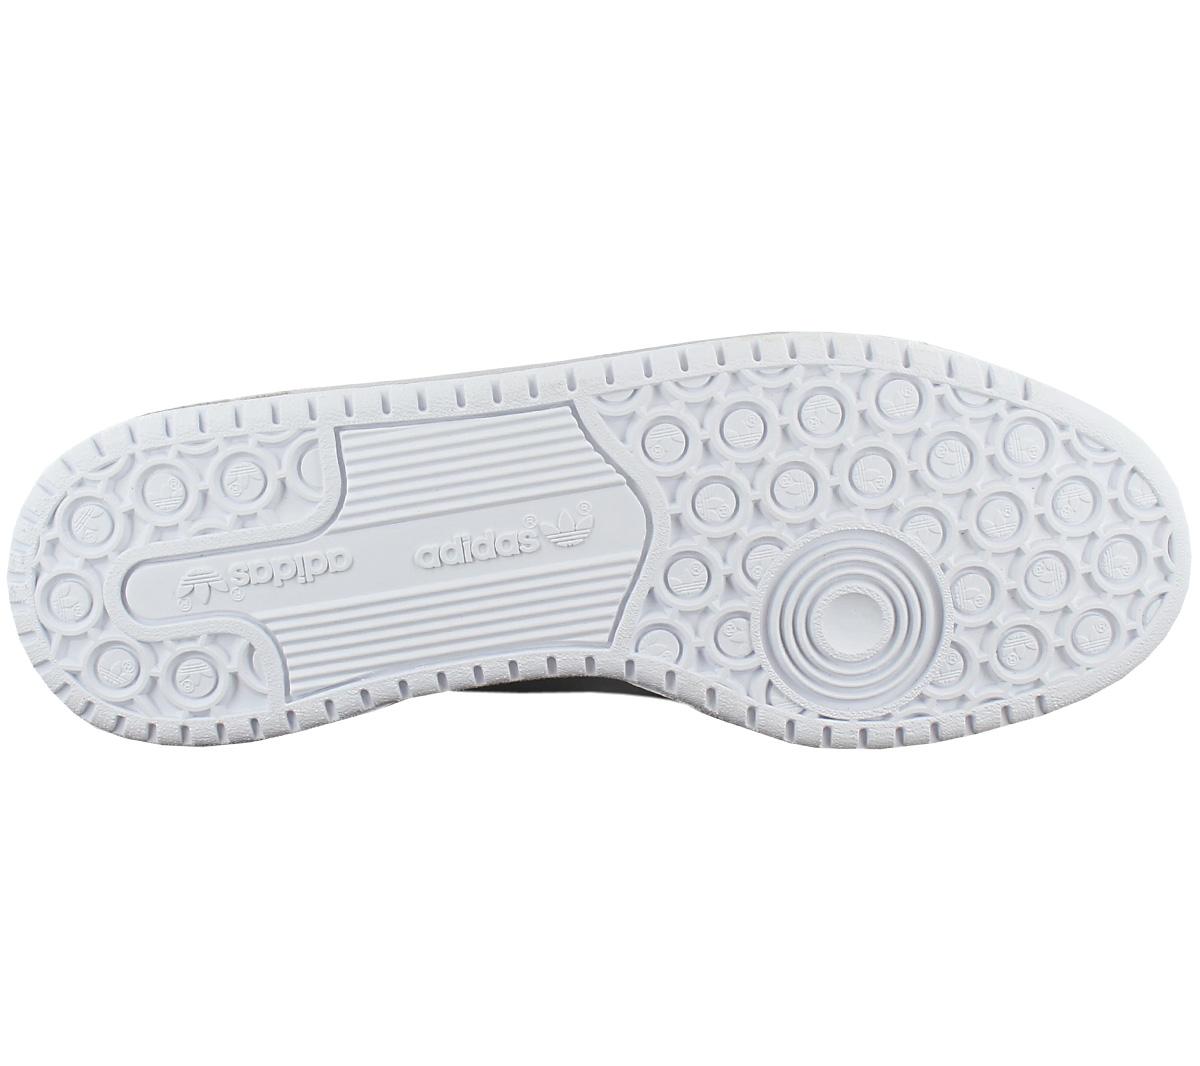 the best attitude 6c7f7 e795e Adidas Originals Forum Winter Pk Primeknit Shoes Trainers Bo